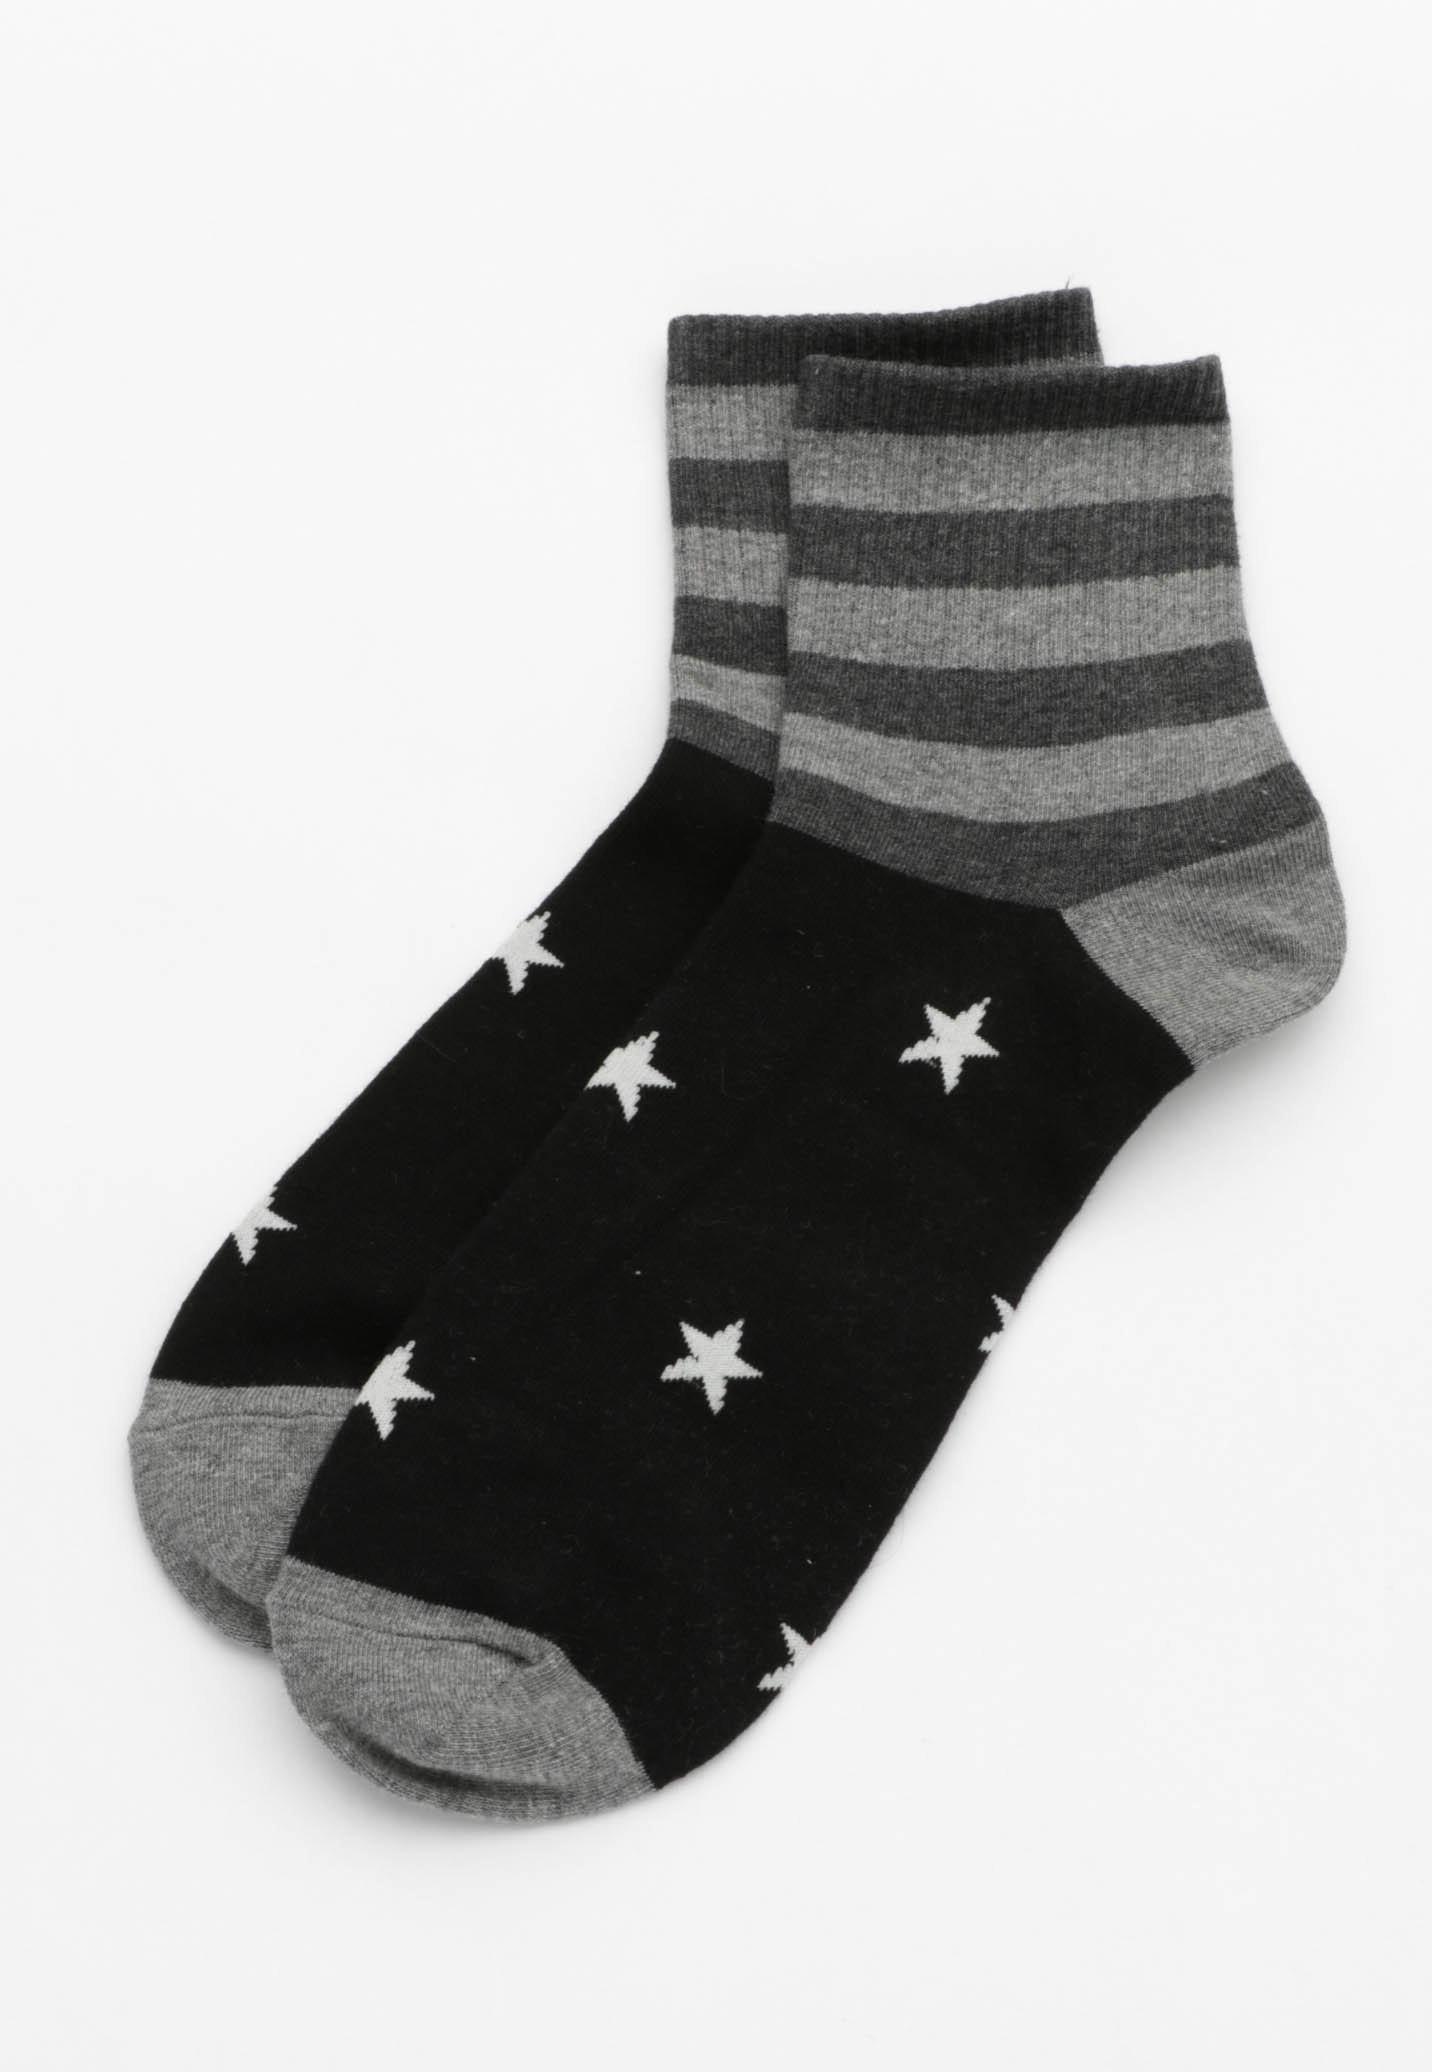 Stars and Stripes Socks - Black/grey